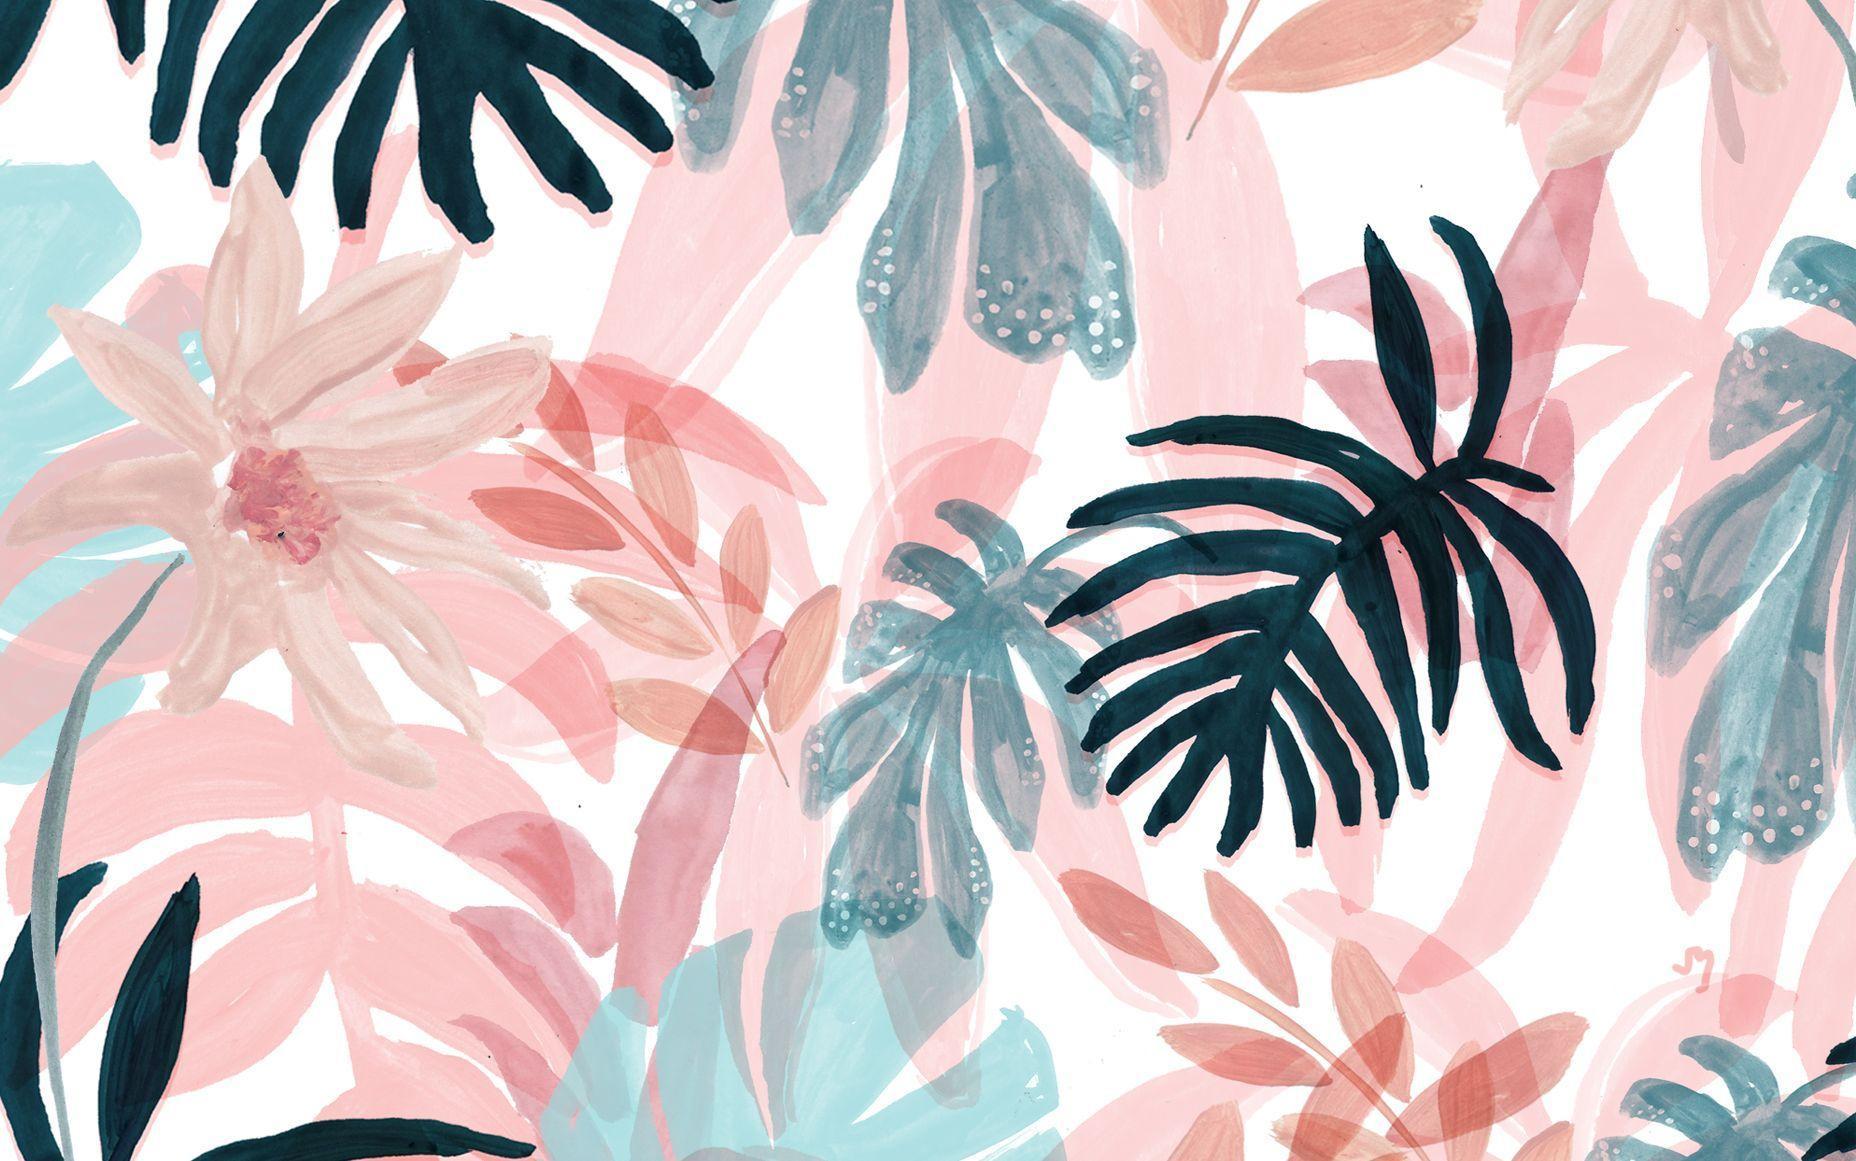 Mac Pink Aesthetic Wallpapers Top Free Mac Pink Aesthetic Backgrounds Wallpaperaccess